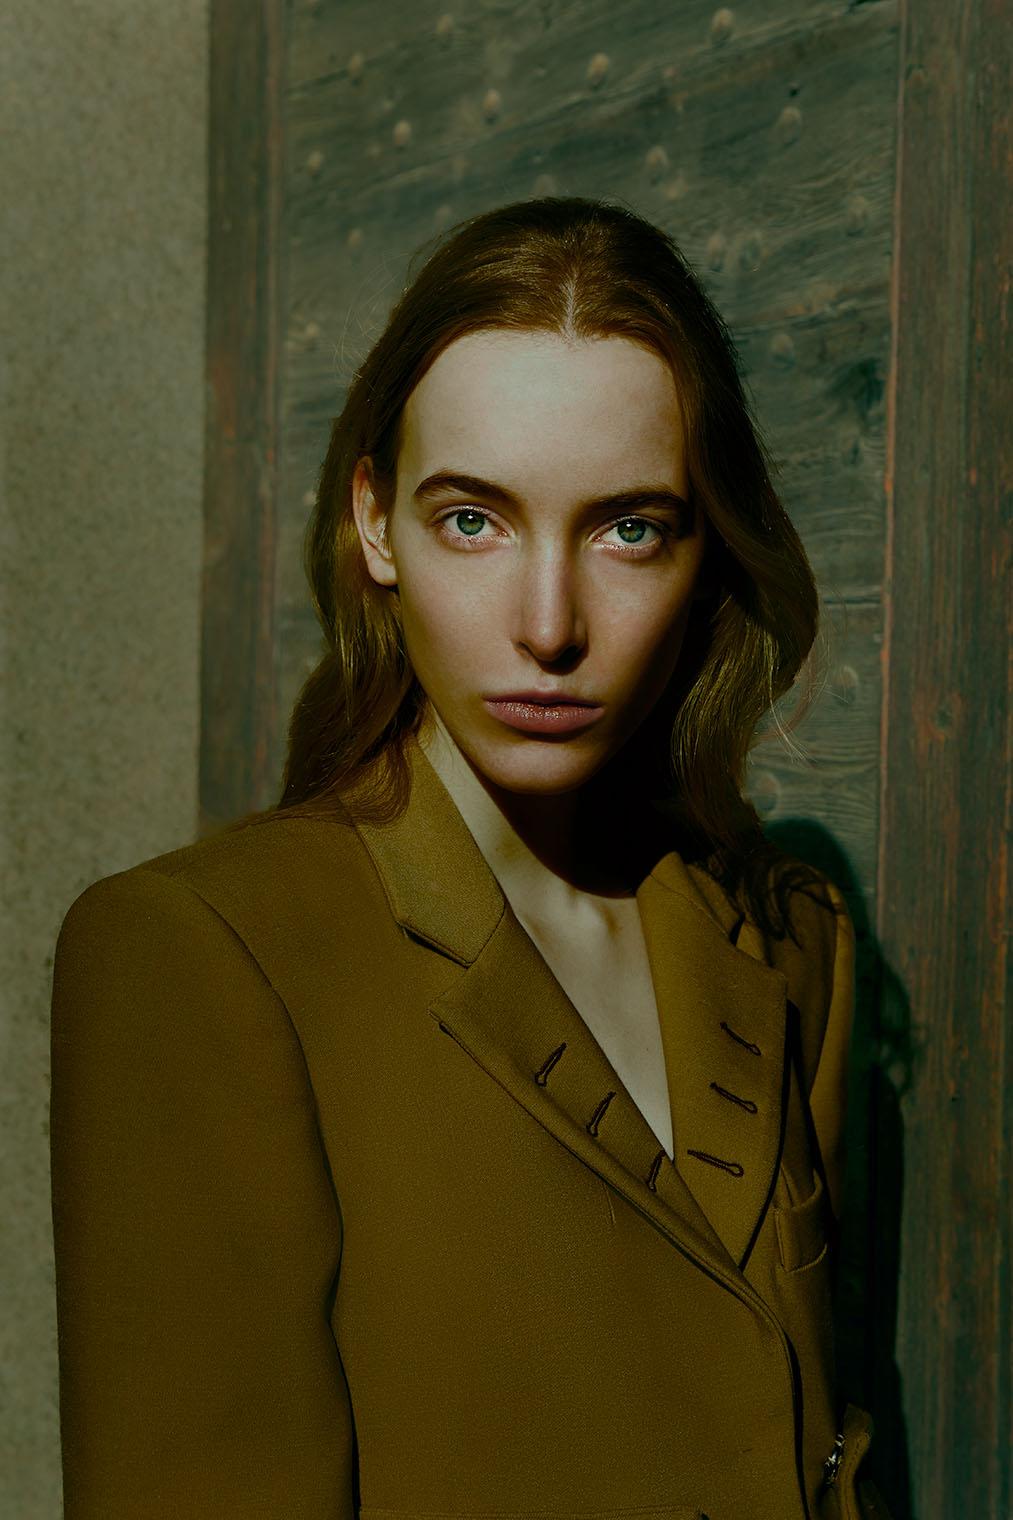 dark fashion portrait of woman in Italy